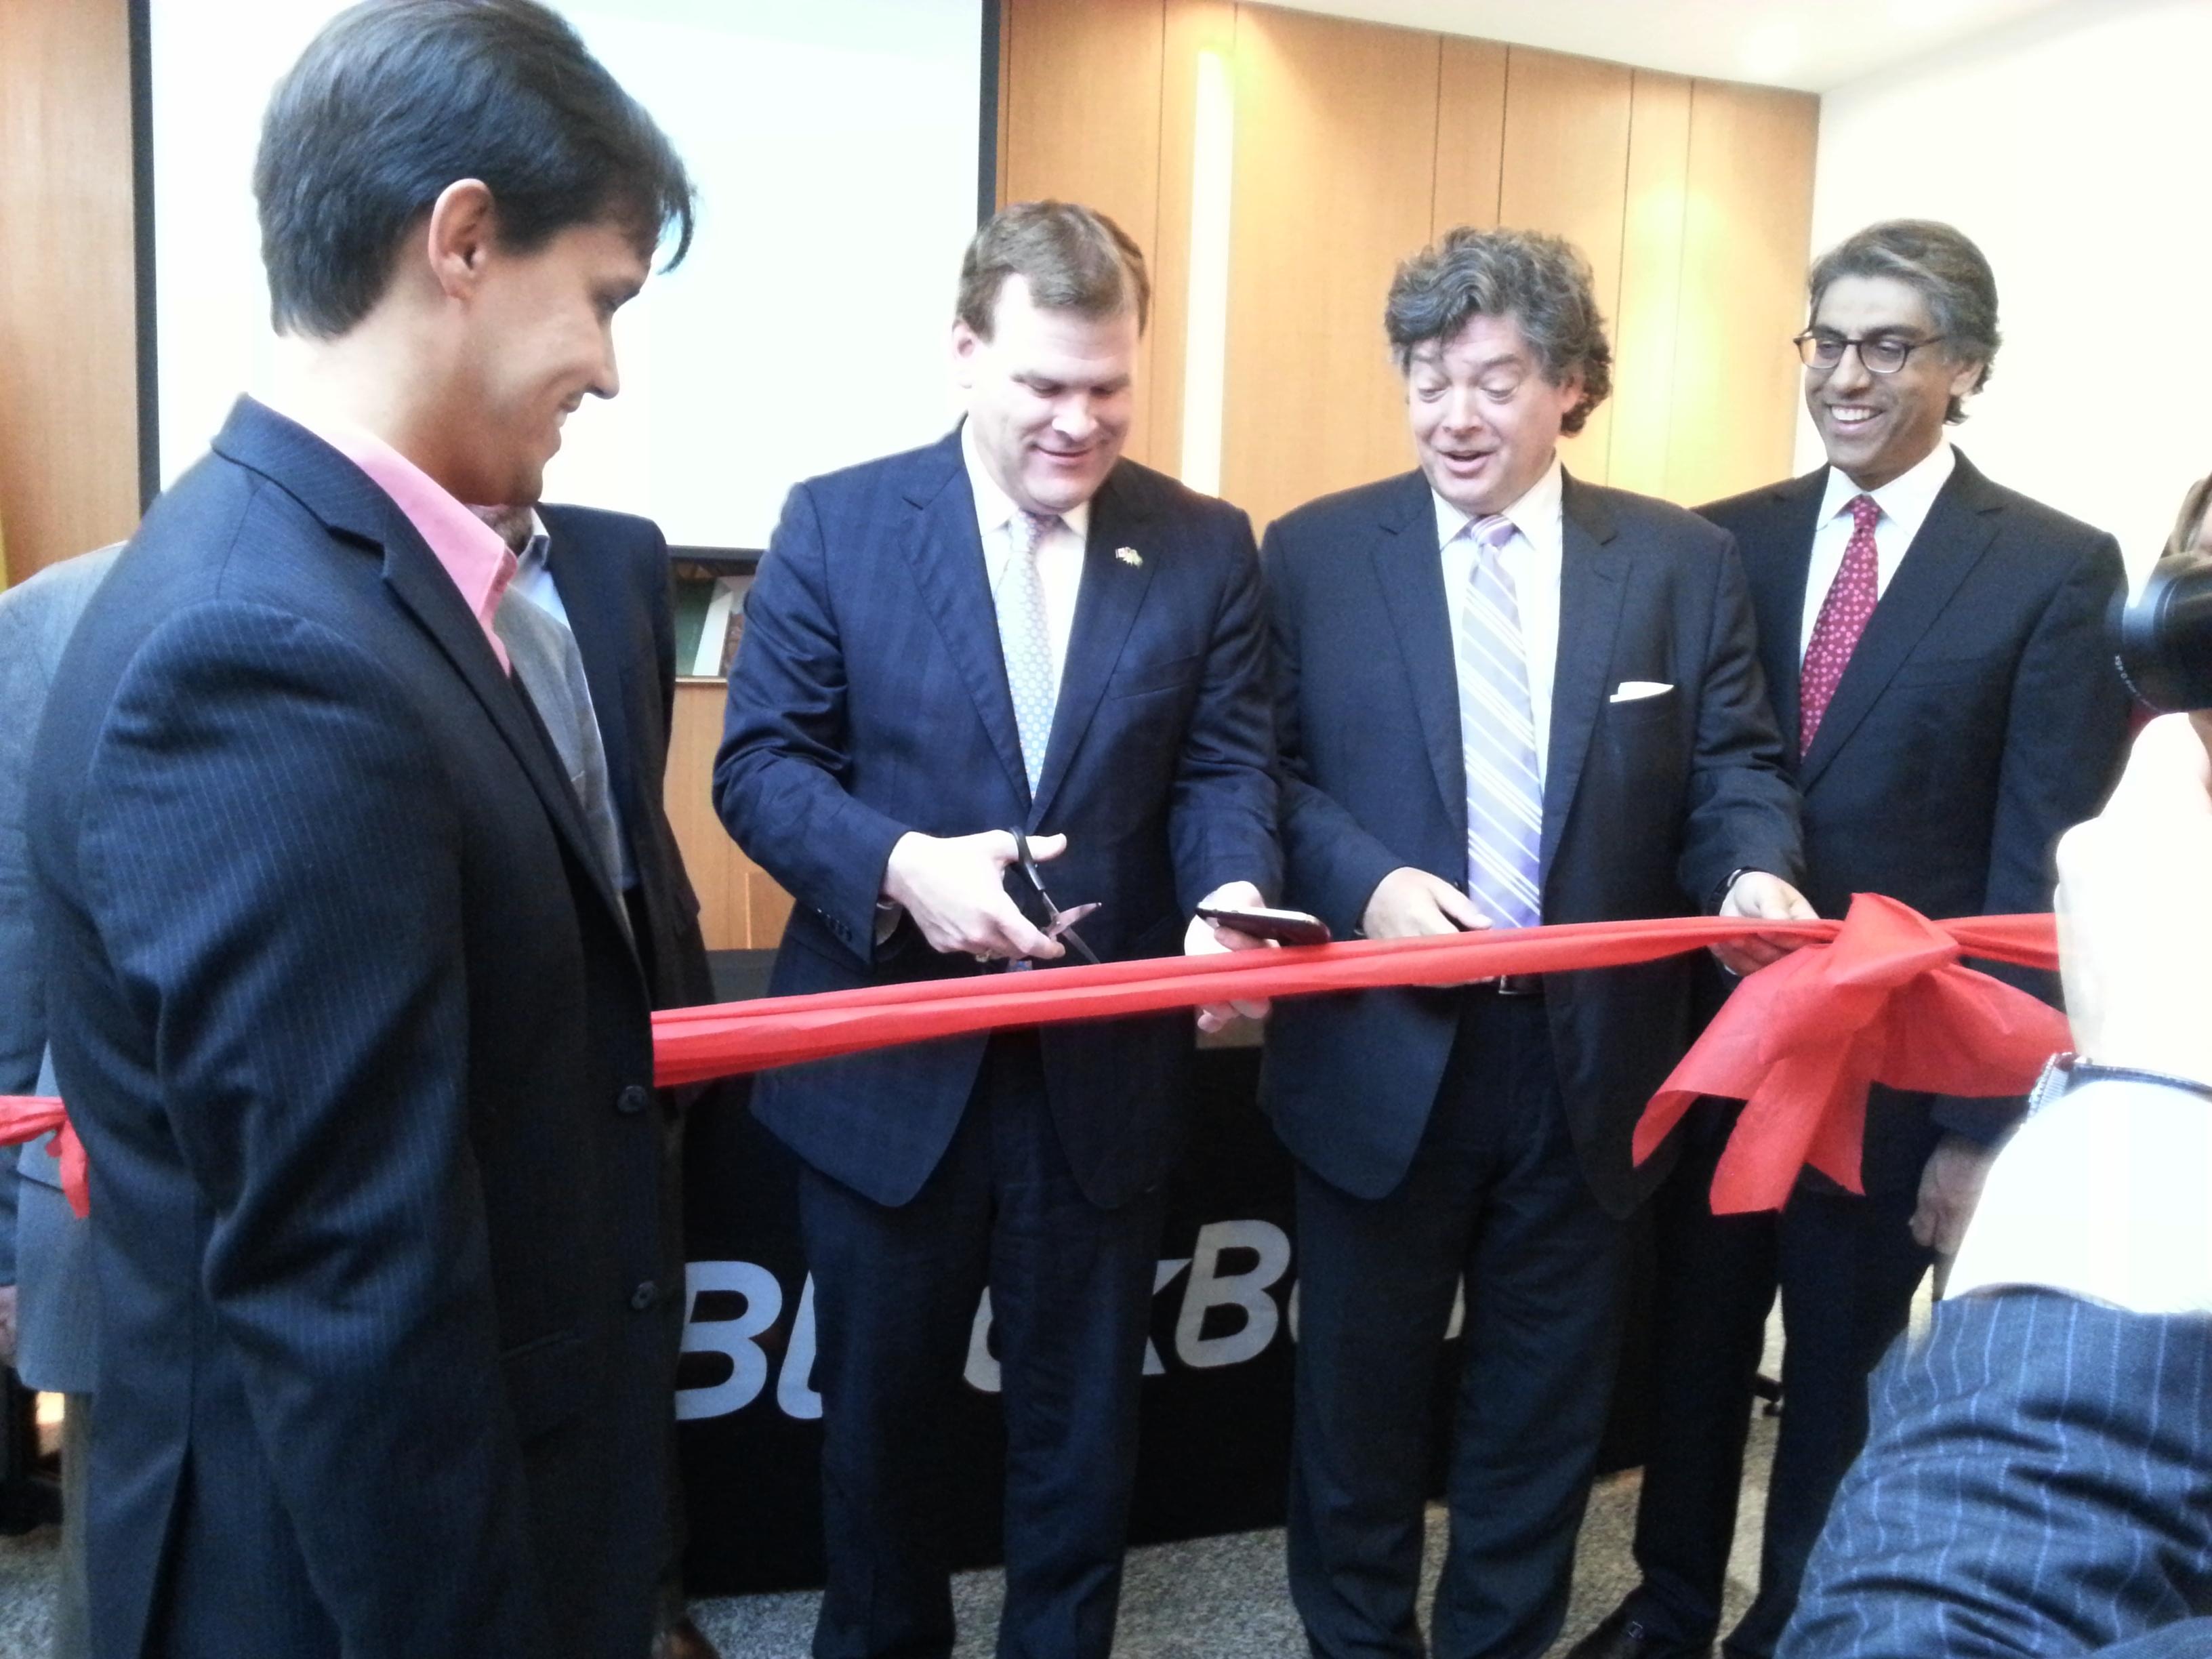 John Baird inaugurou o novo Tech Center ao lado de David Paterson e outros integrantes da BlackBerry Brasil (Foto: Gabriela Viana)